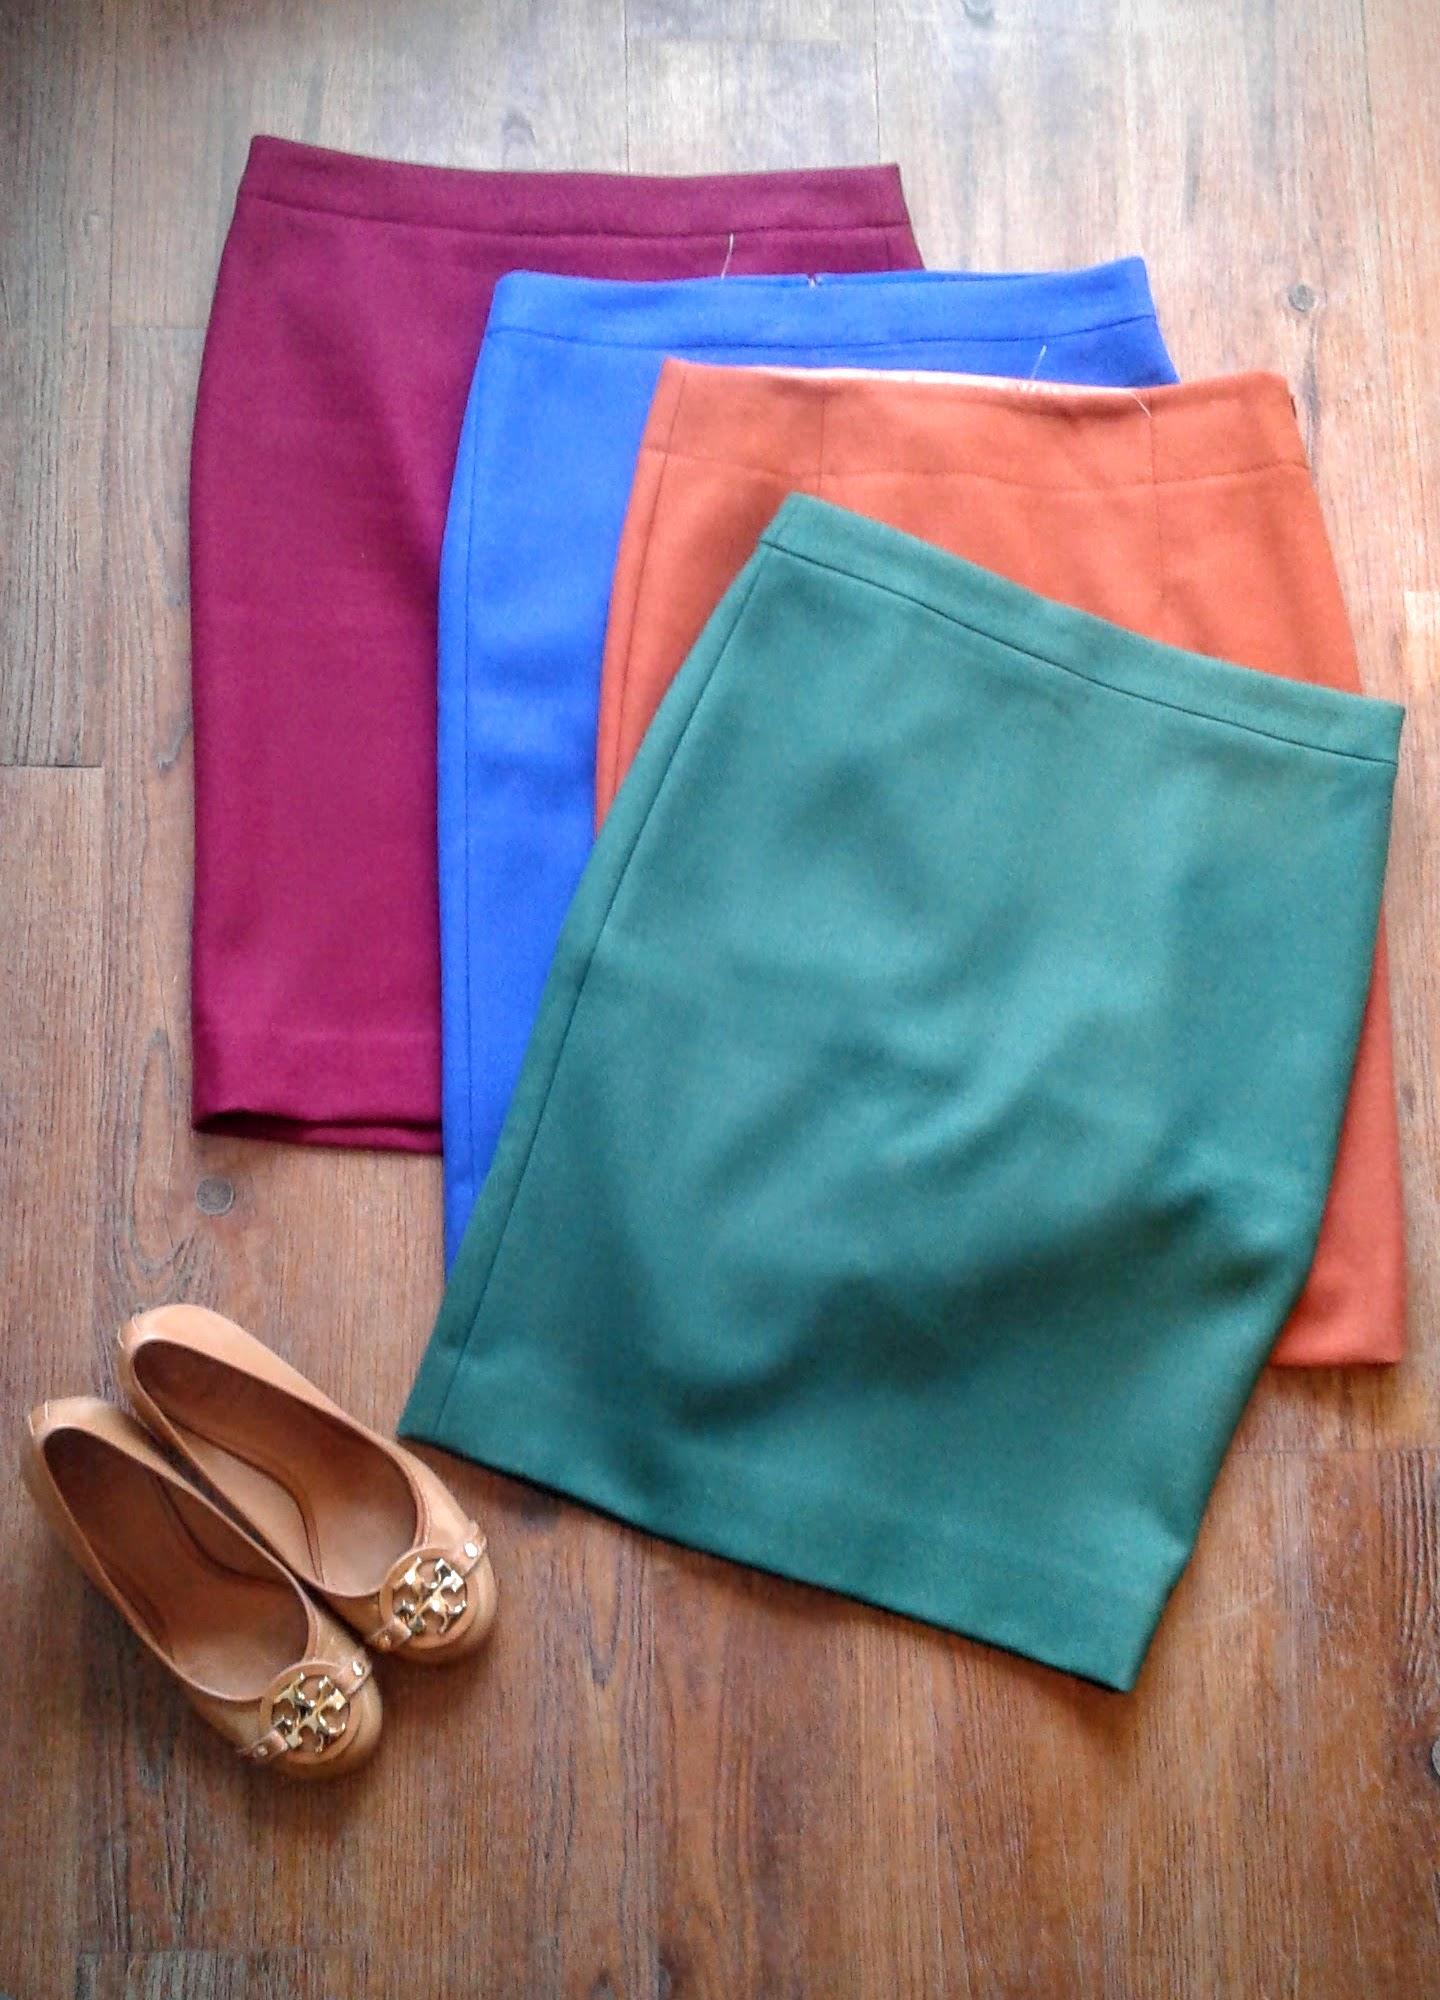 JCrew wool skirts, sizes 4-10, $42 each